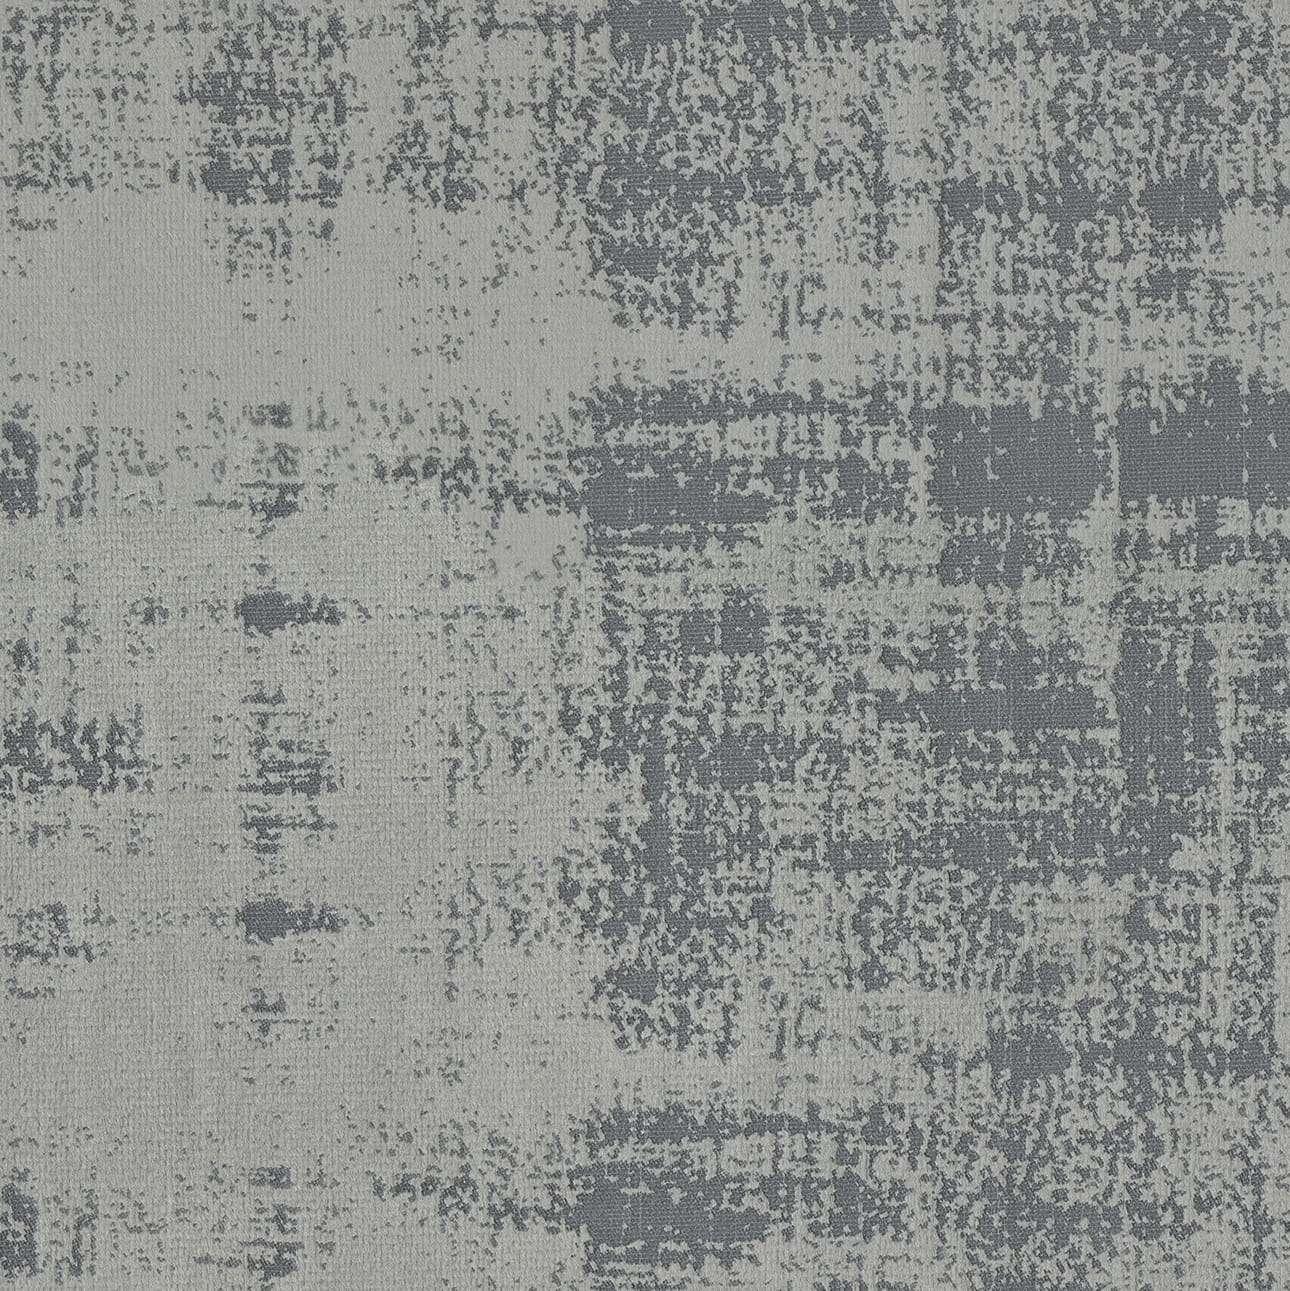 Zasłona na kółkach 1 szt. w kolekcji Velvet, tkanina: 704-32